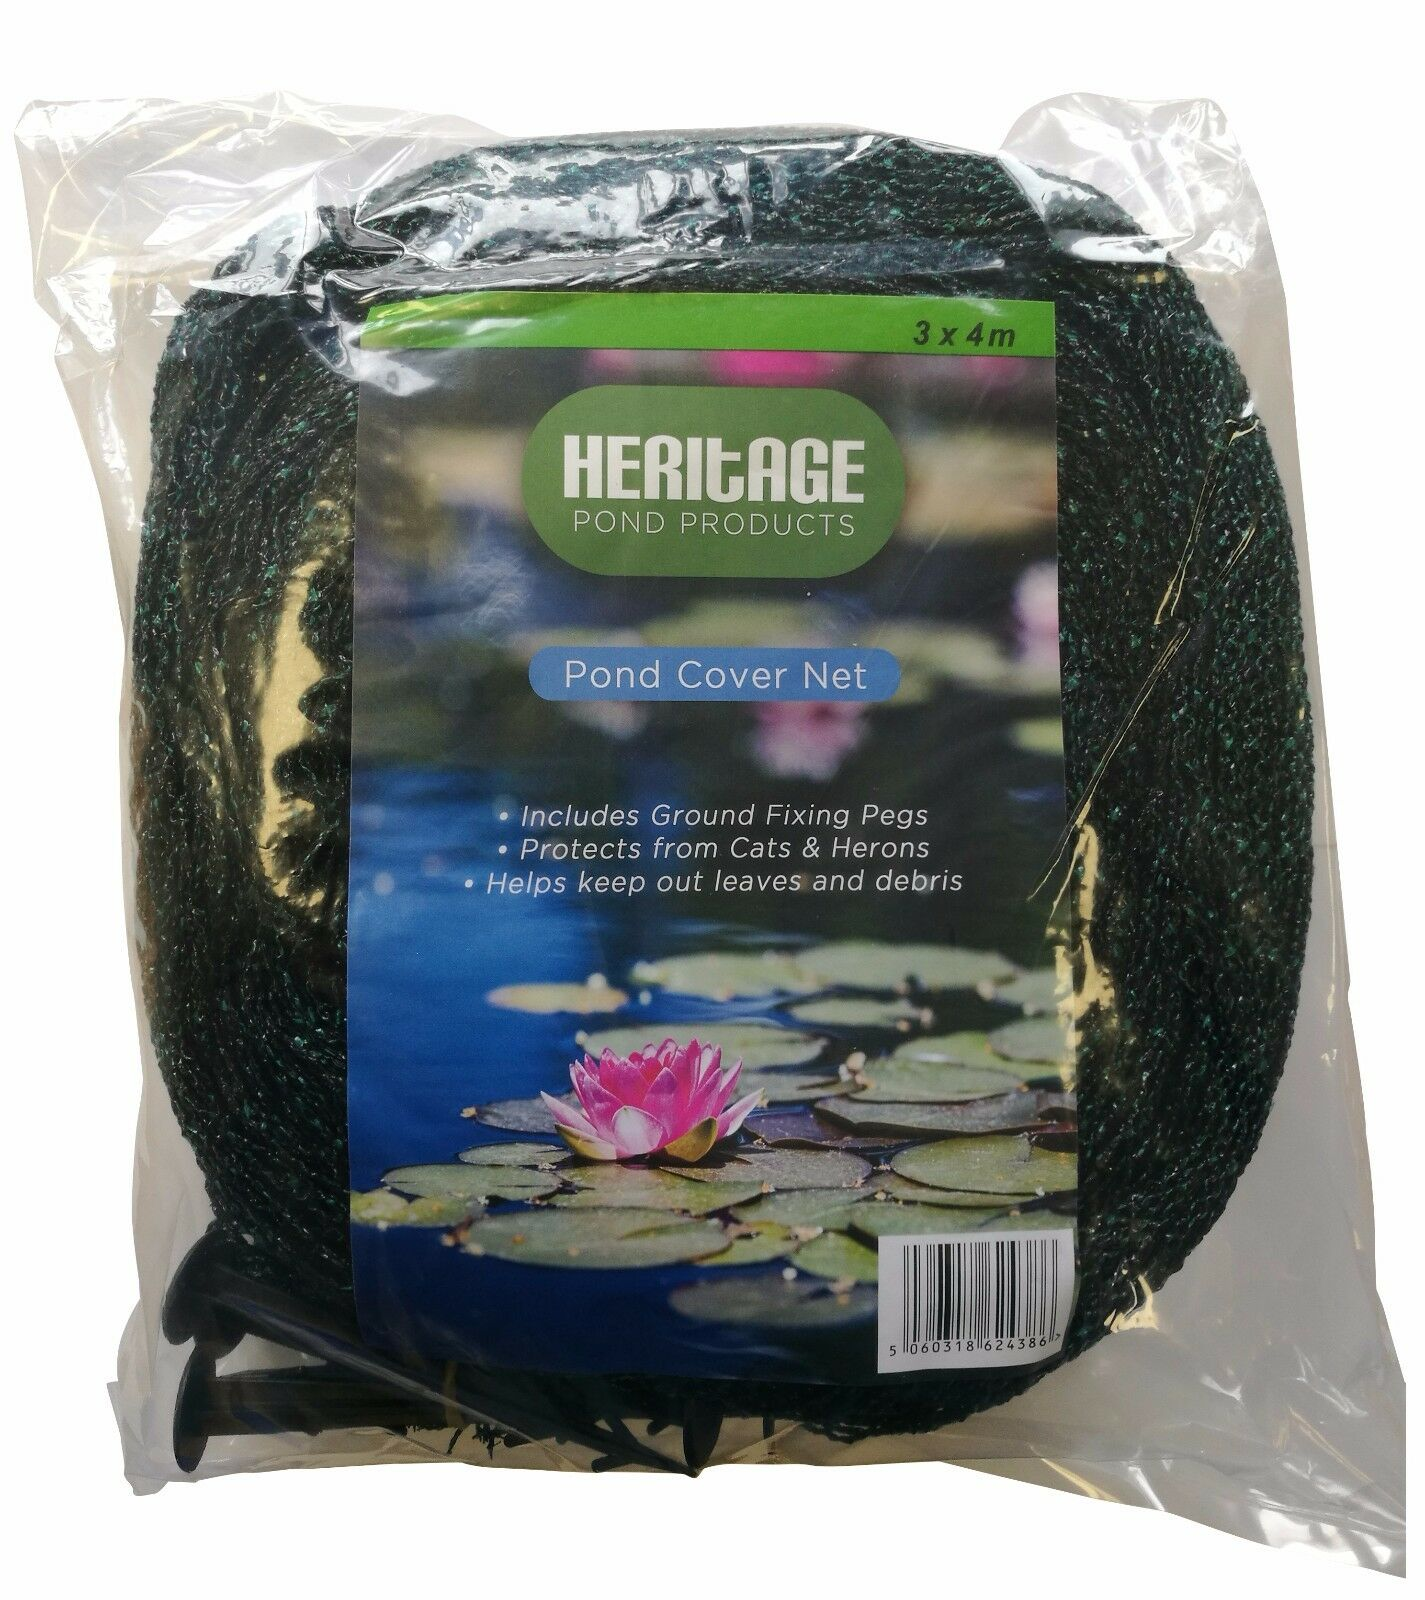 Koi Fish Pond Pool Cover Net Protector 2M 3M 4M 6M 10M Heron Cats Netting Leaves